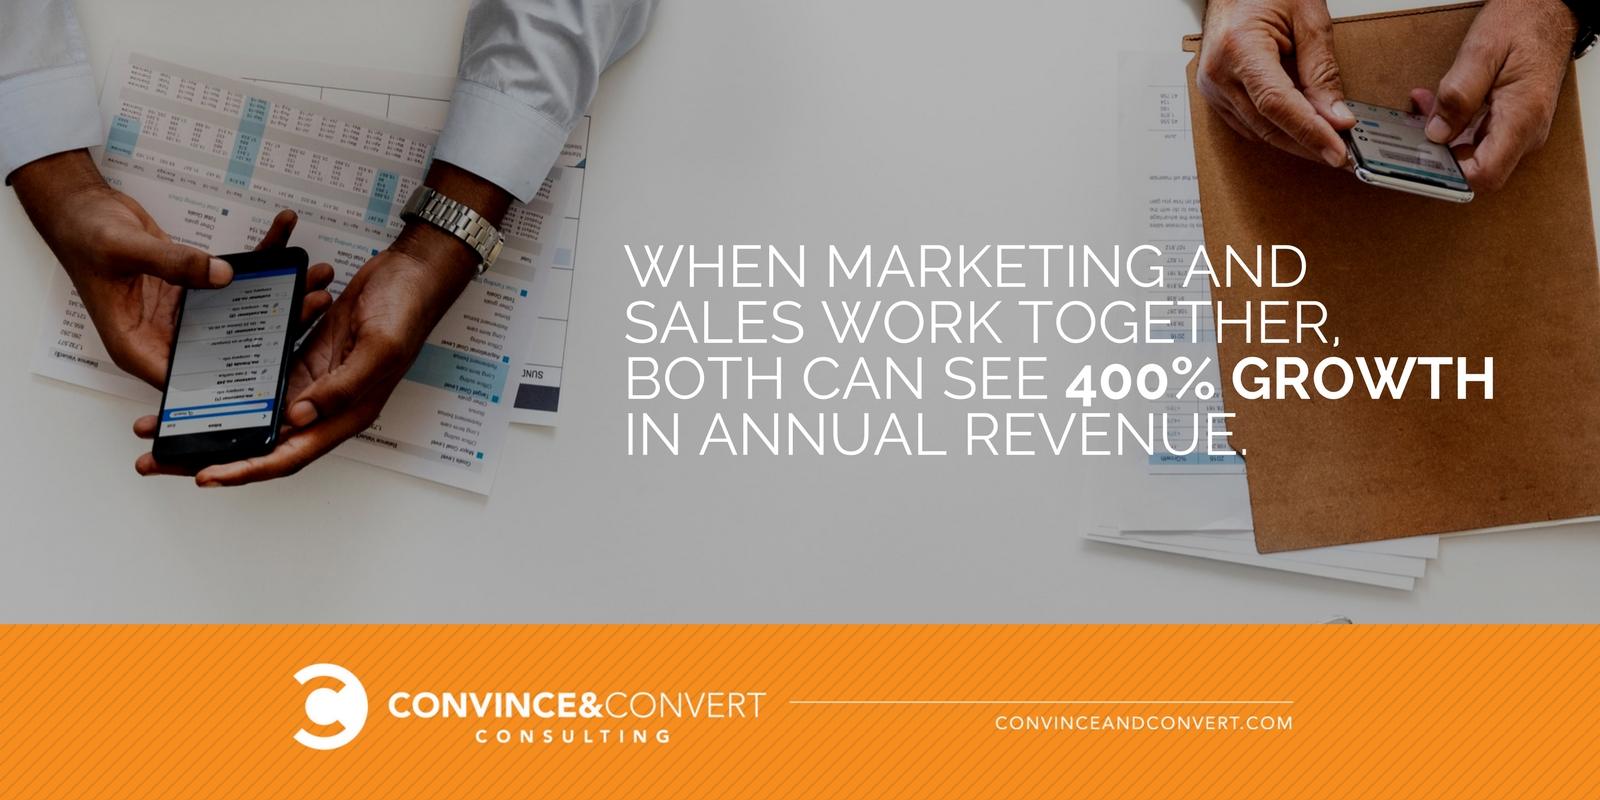 Quando marketing e vendite lavorano insieme